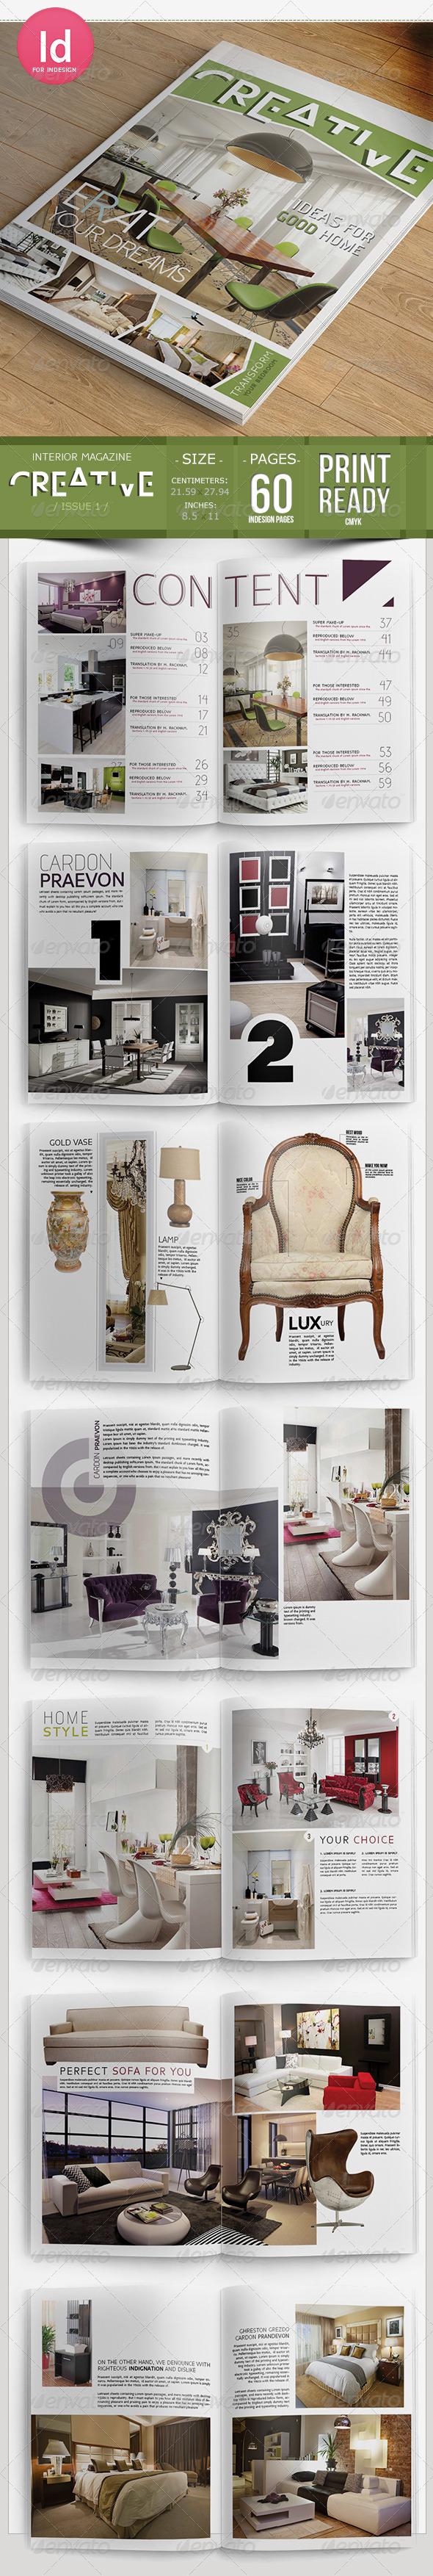 Creative Interior Magazine Template - Magazines Print Templates